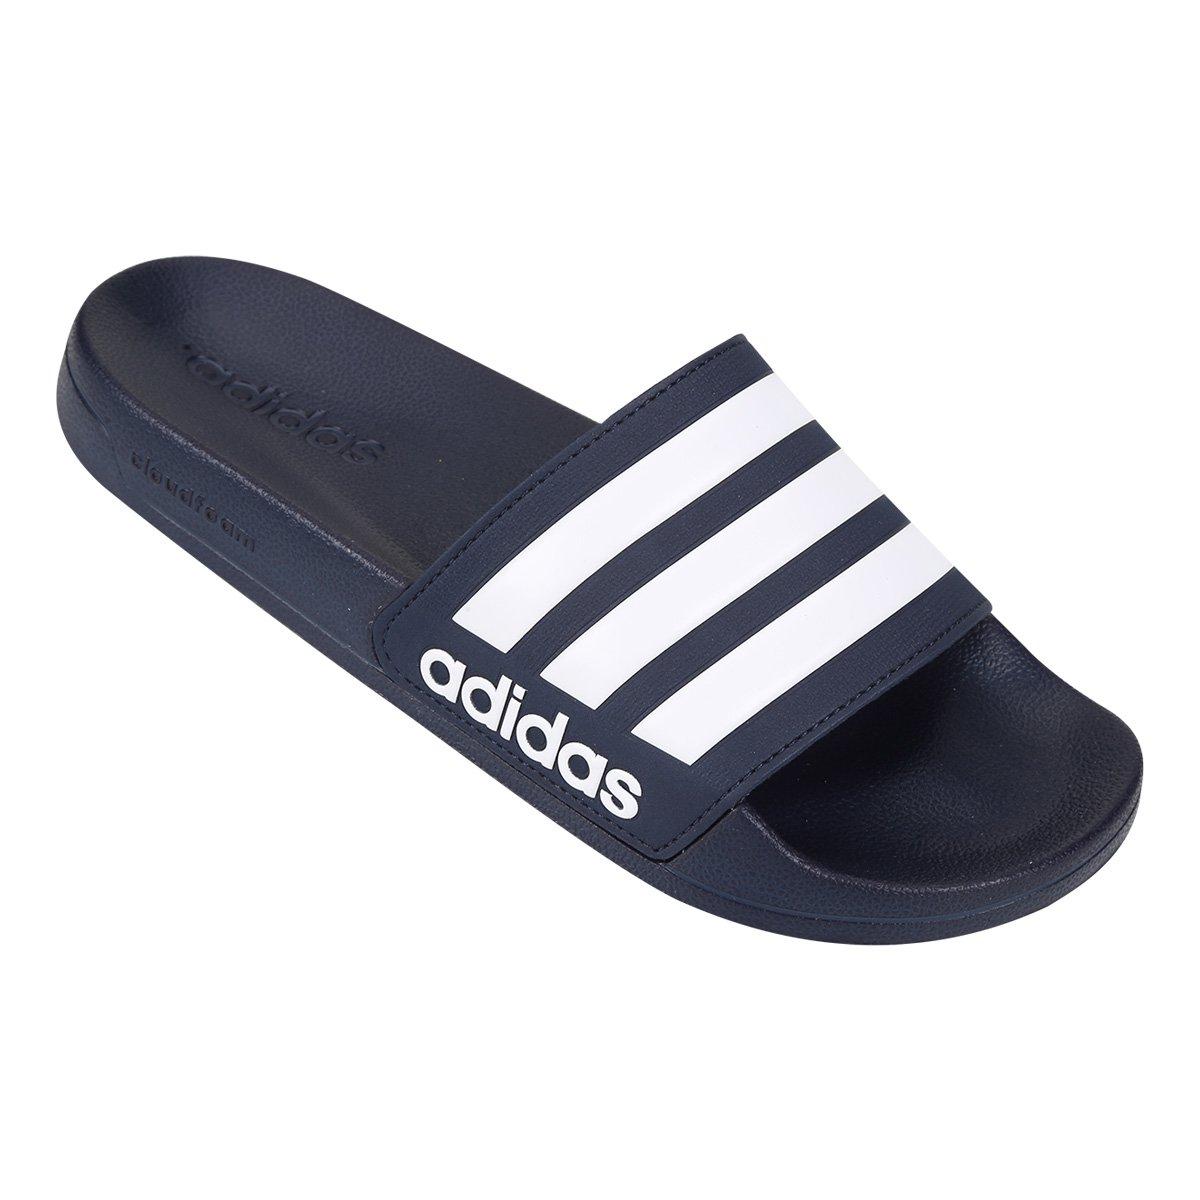 Chinelo Slide Adidas Adilette Cloudfoam Masculino - Tam: 38/39 - 1